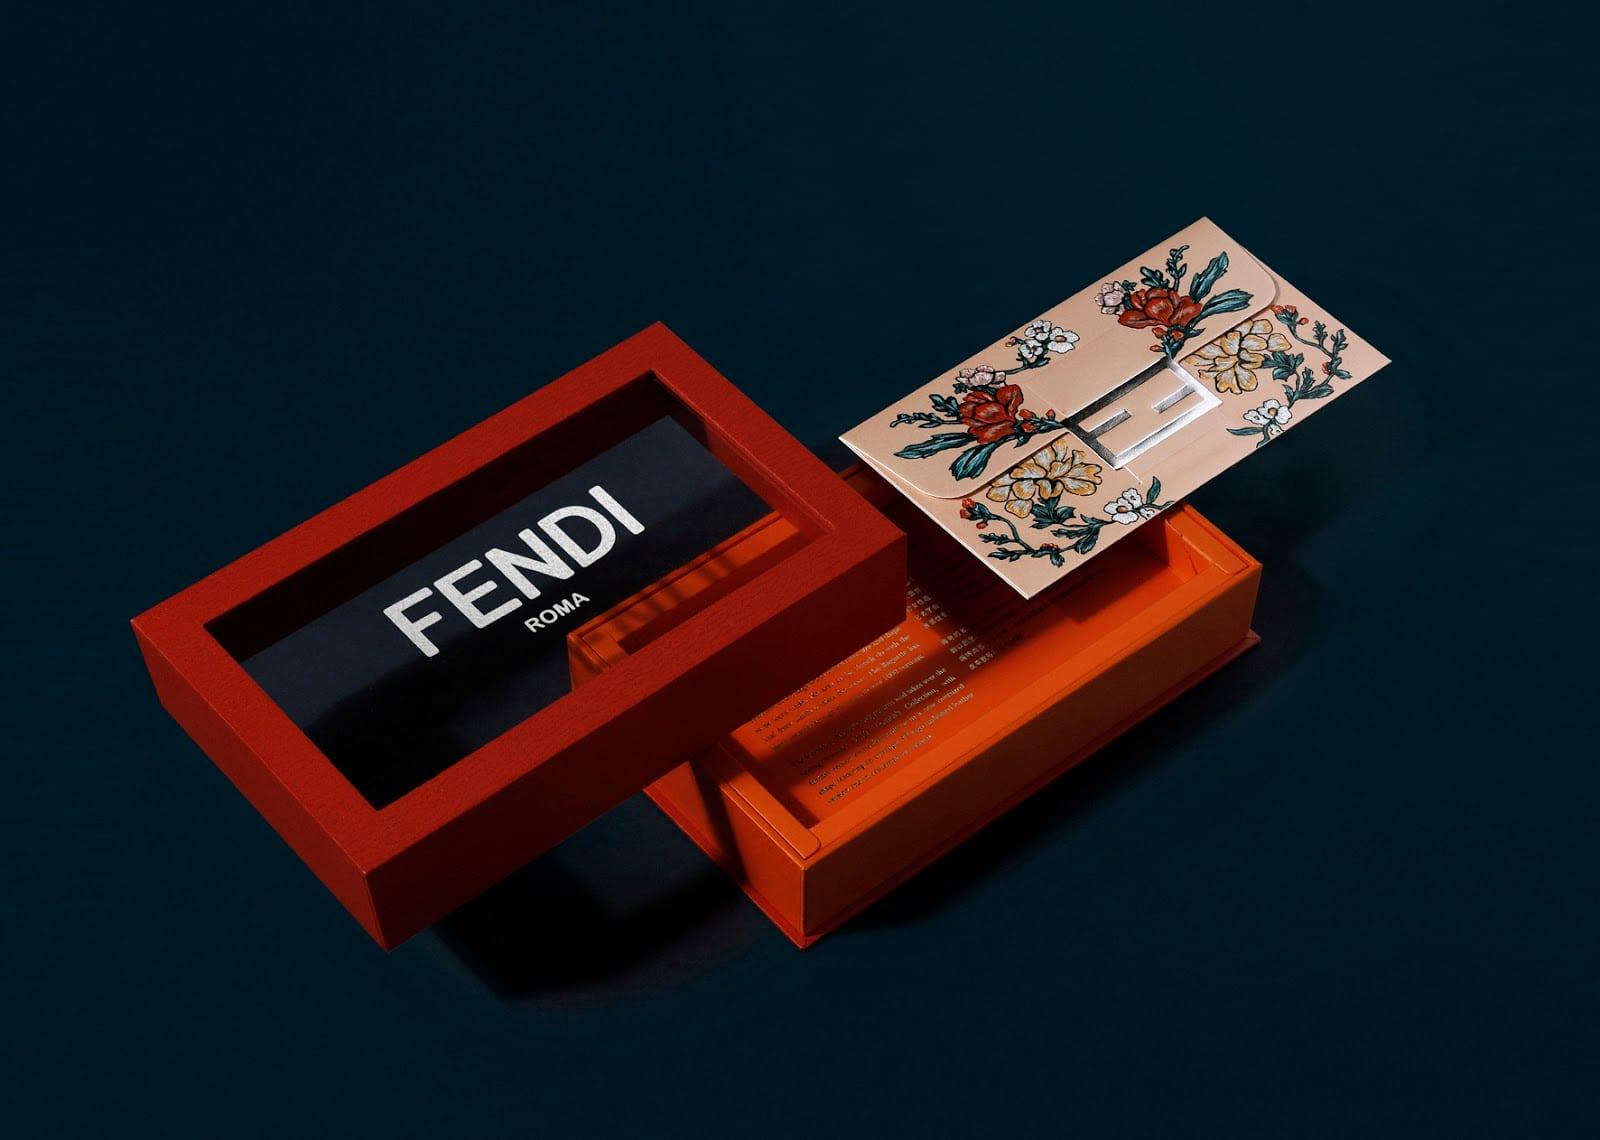 fendi cny regular 02 - Fendi Red Packet 2019